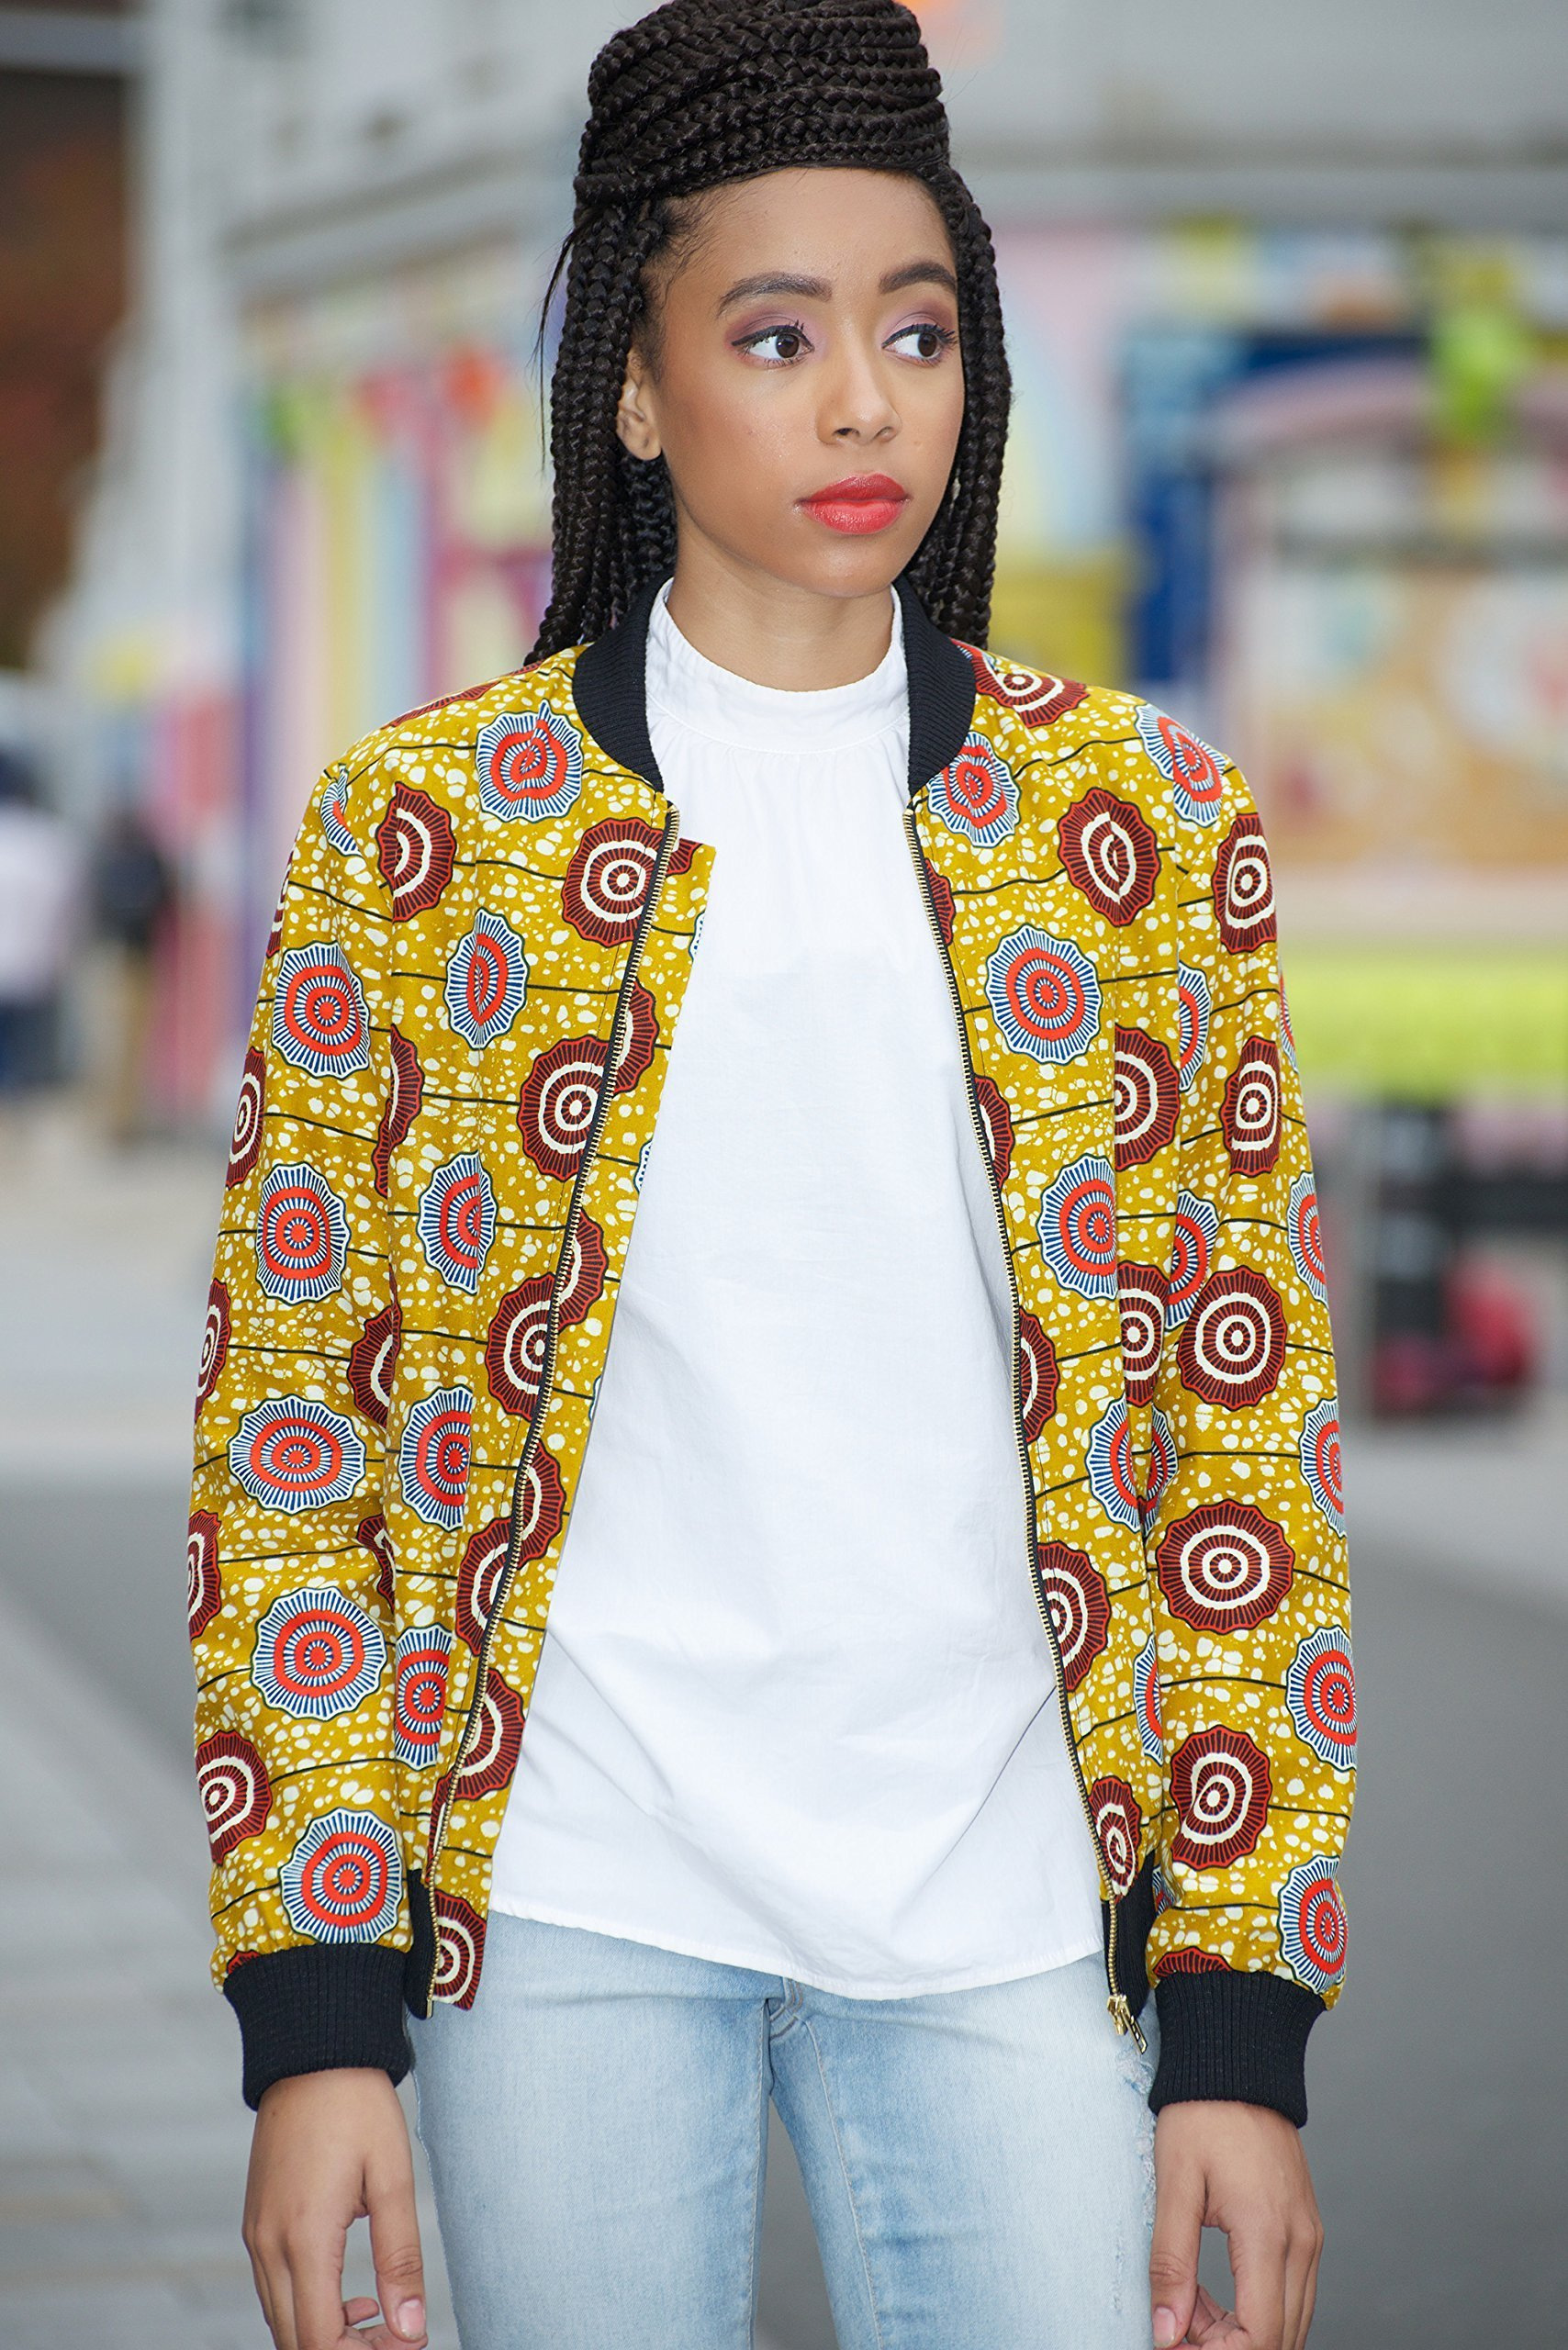 Bomber jacket / African print bomber jacket/ ankara print bomber jacket - light brown